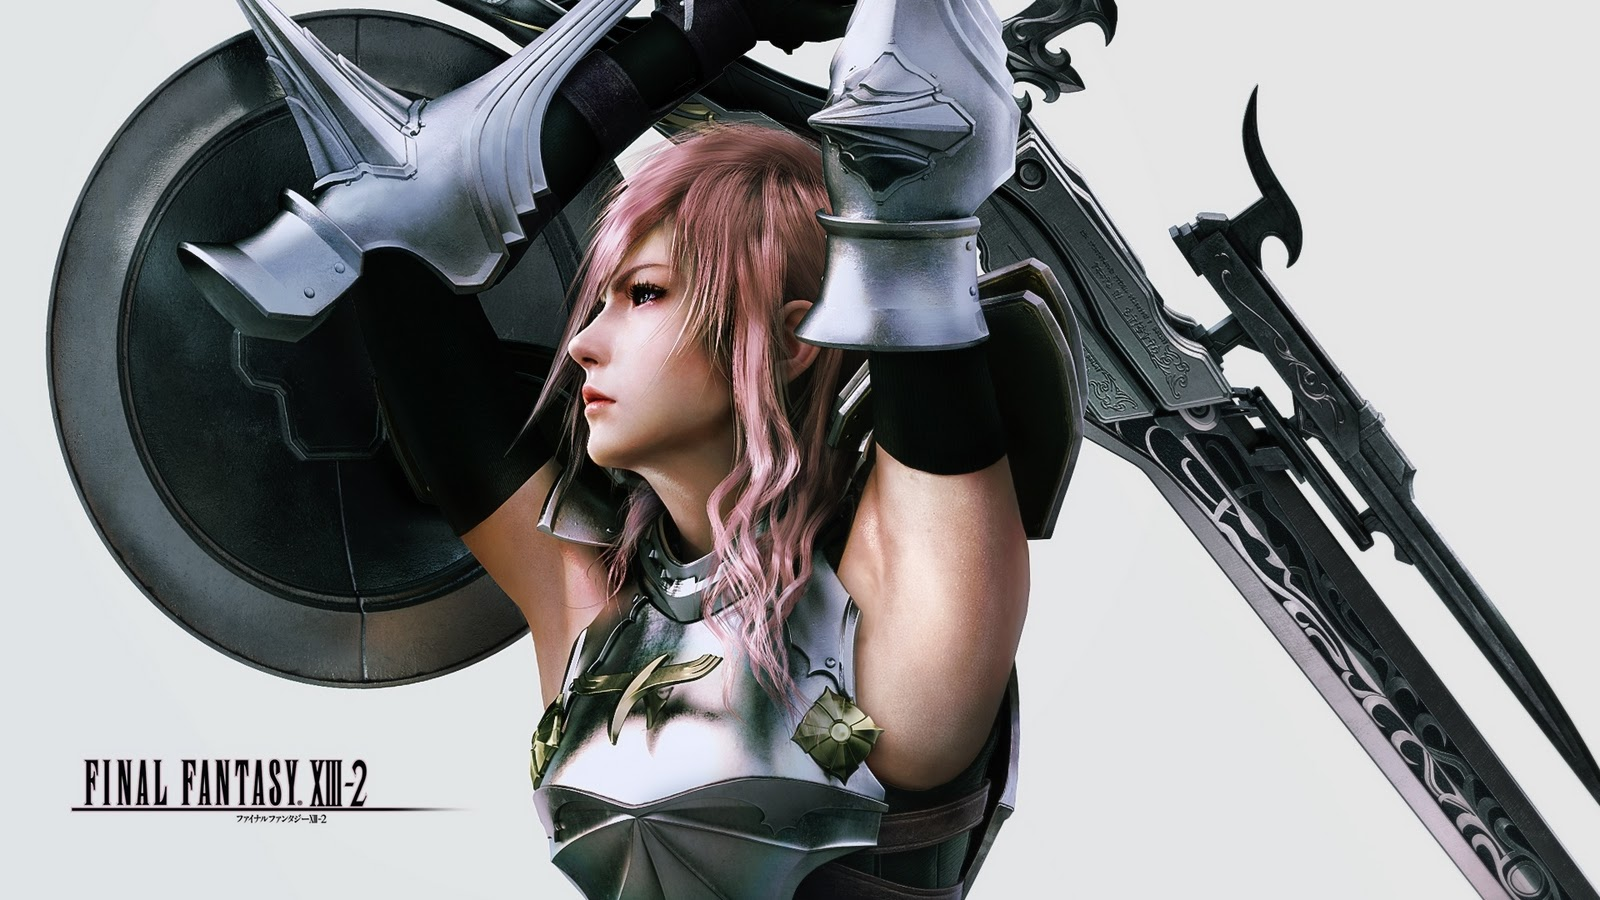 The Bing Final Fantasy Xiii 2 Game Wallpaper